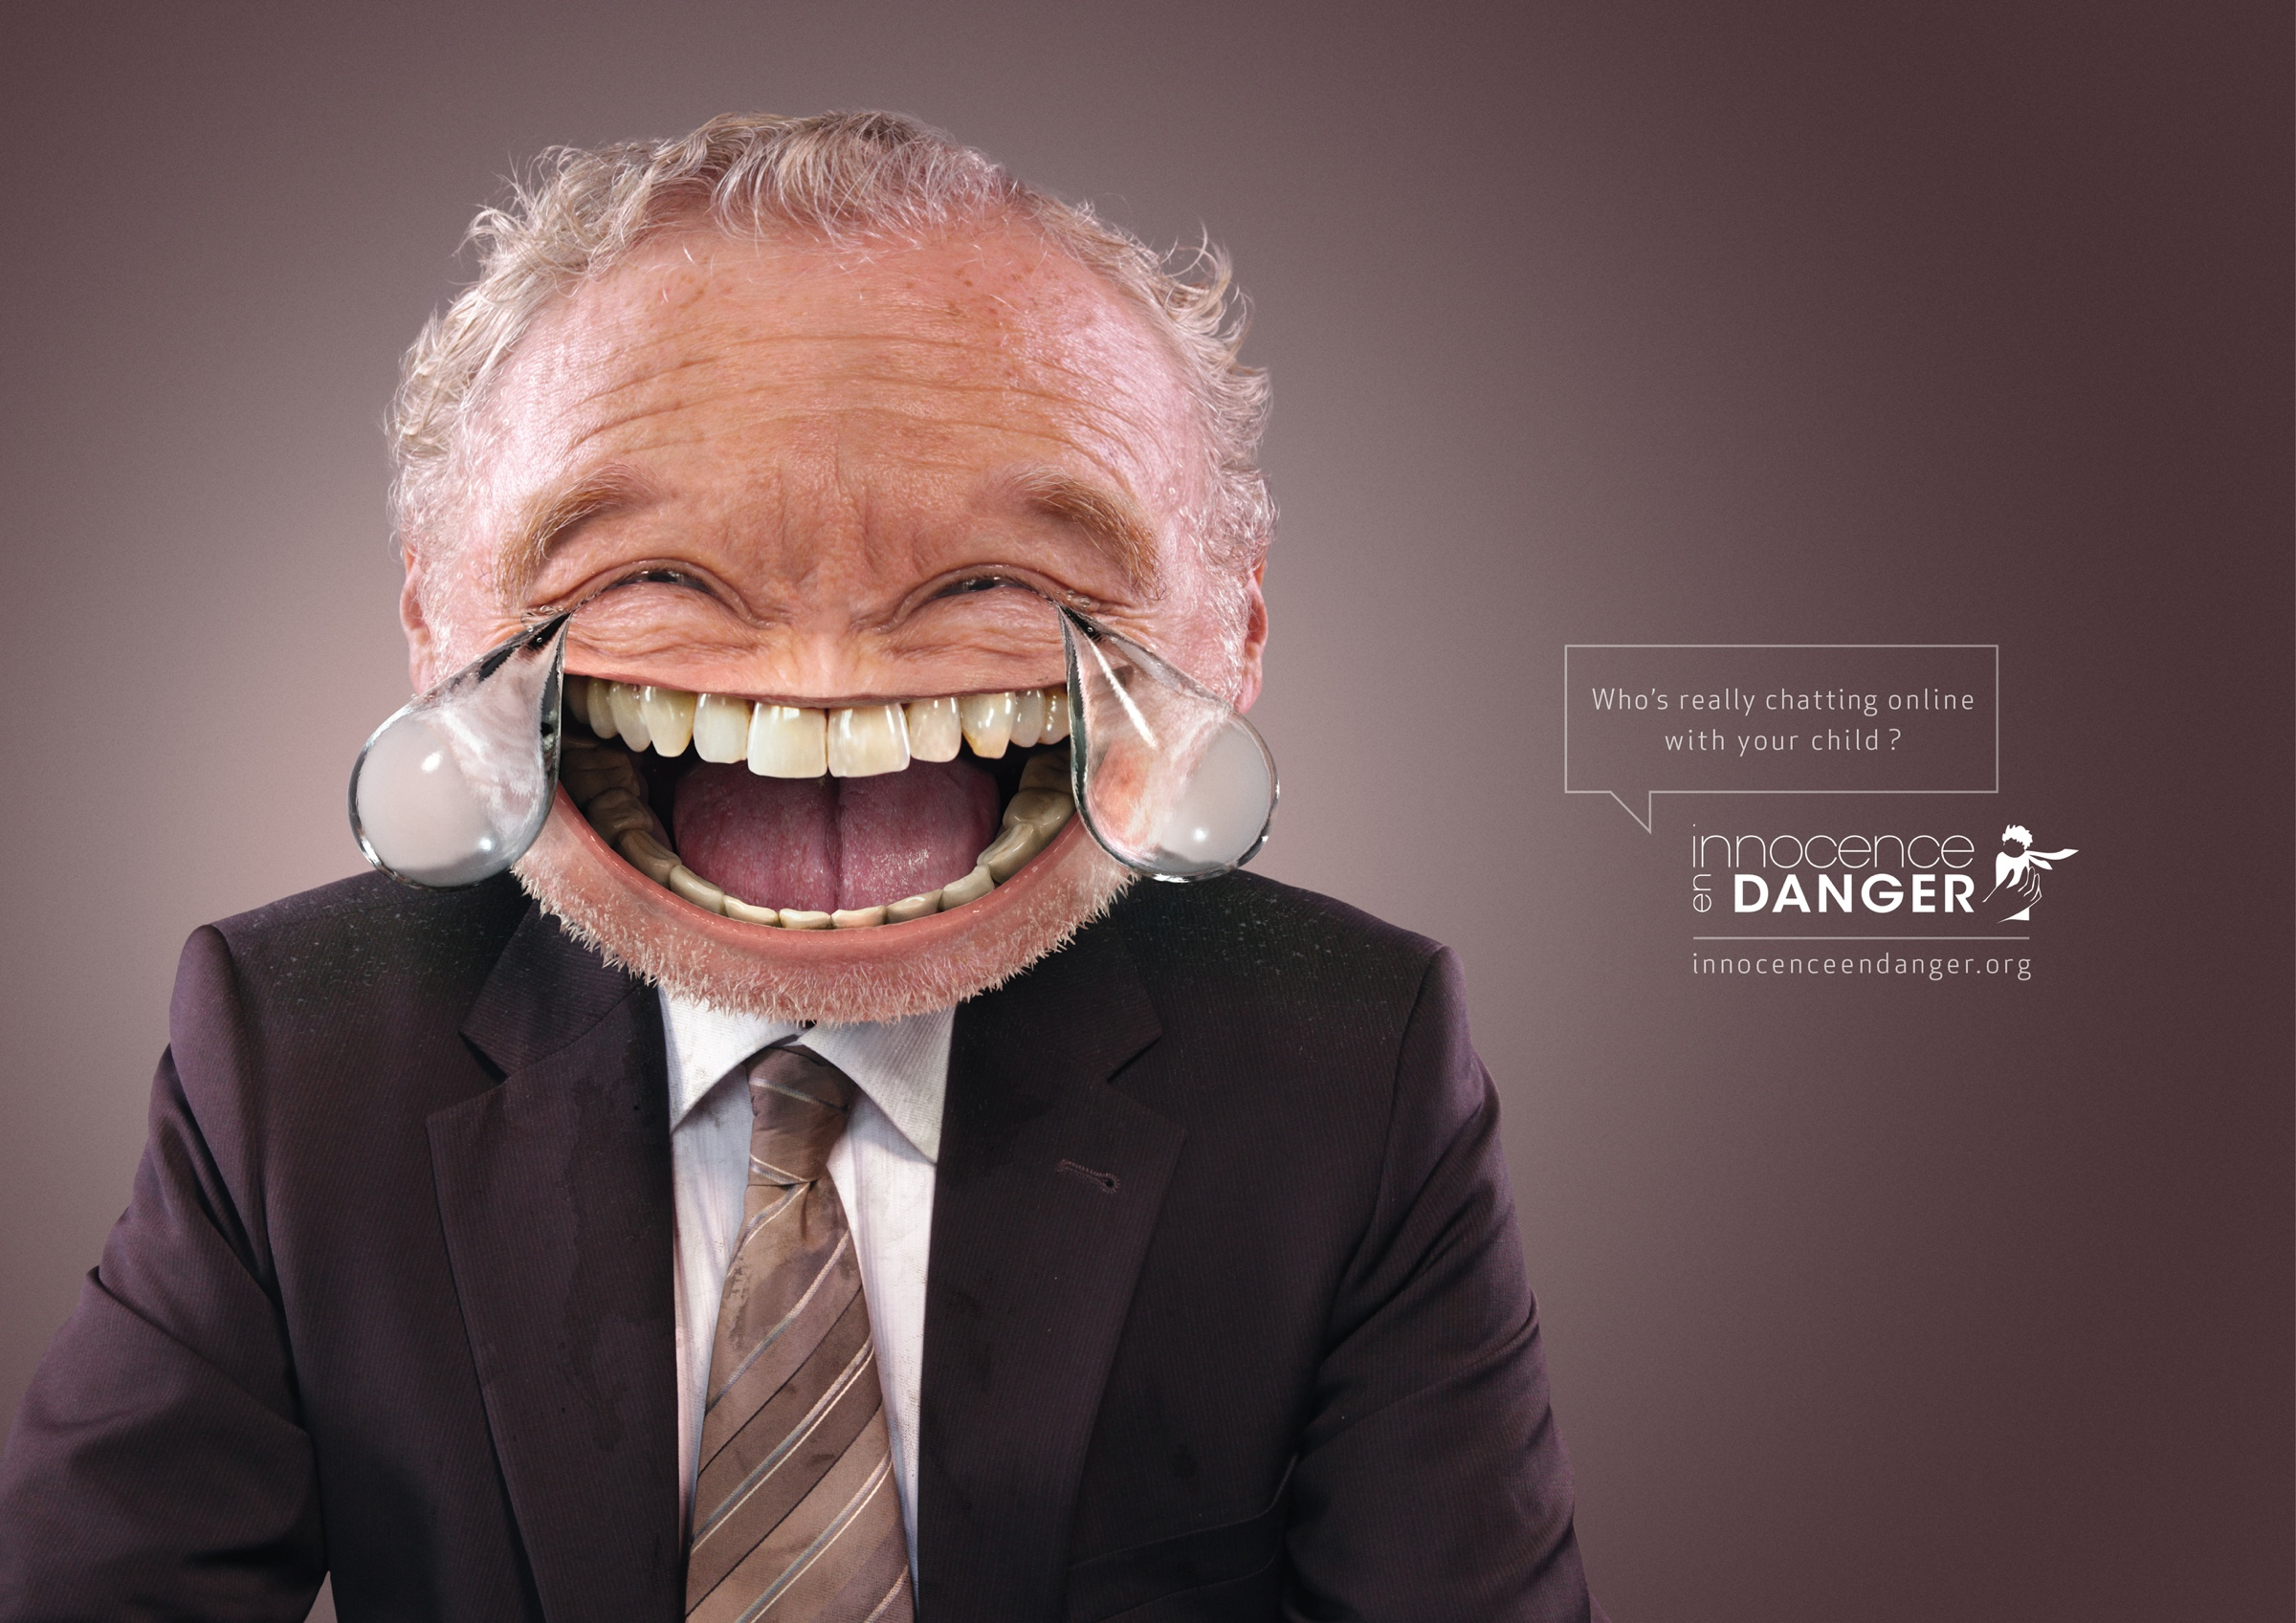 innocence-en-danger-rires-pleurs